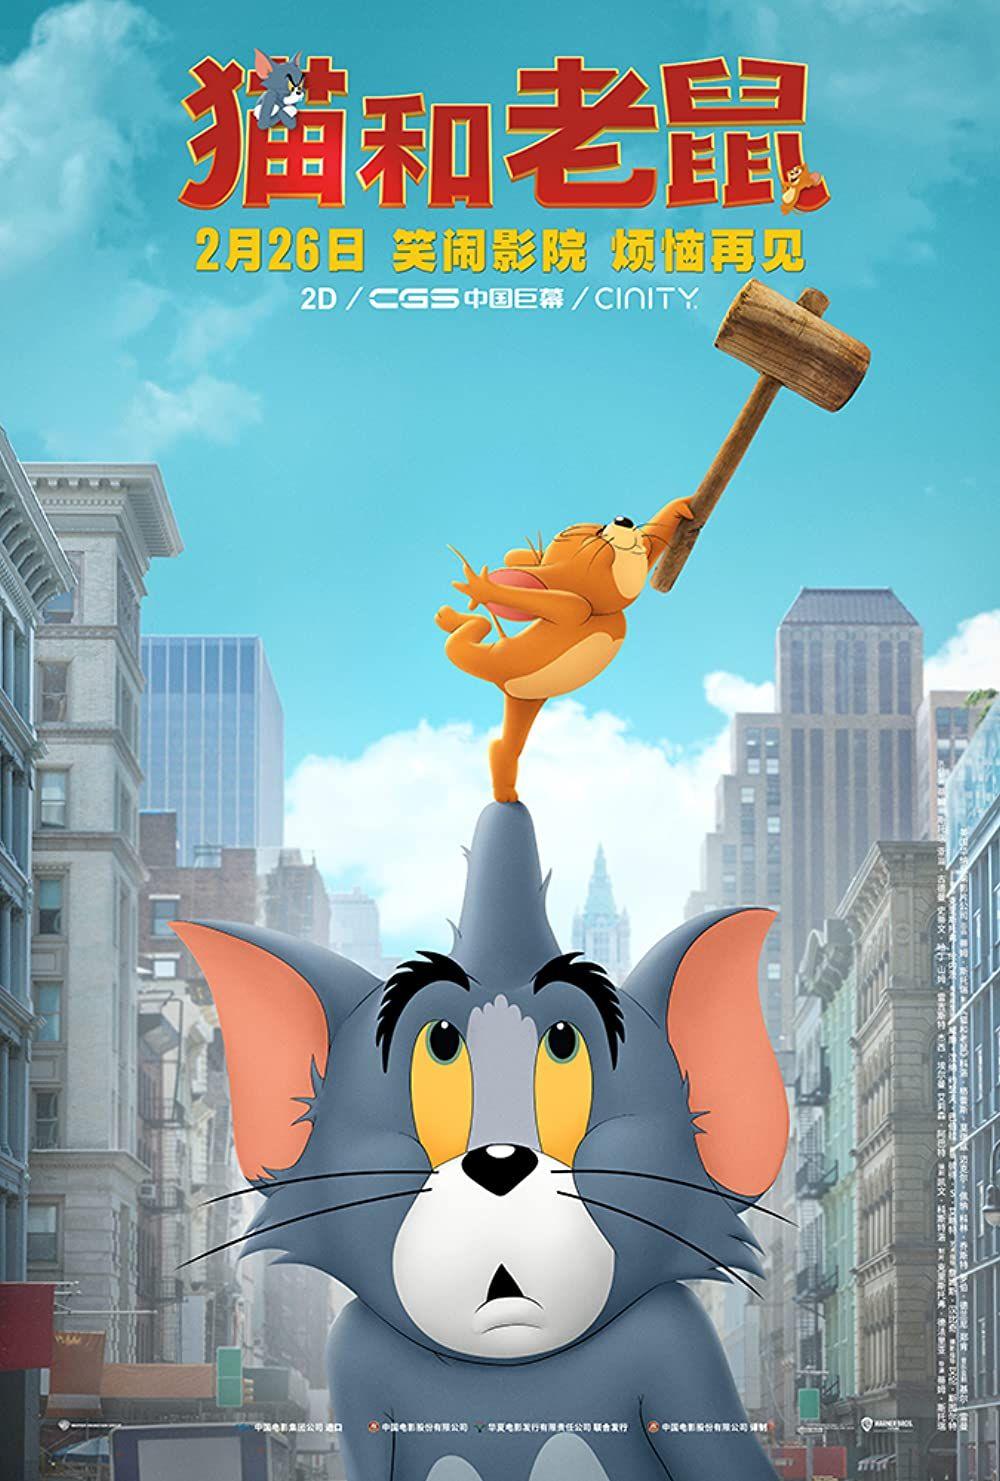 Tom And Jerry 2021 In 2021 Tom And Jerry Tom And Jerry Movies Cartoon Posters